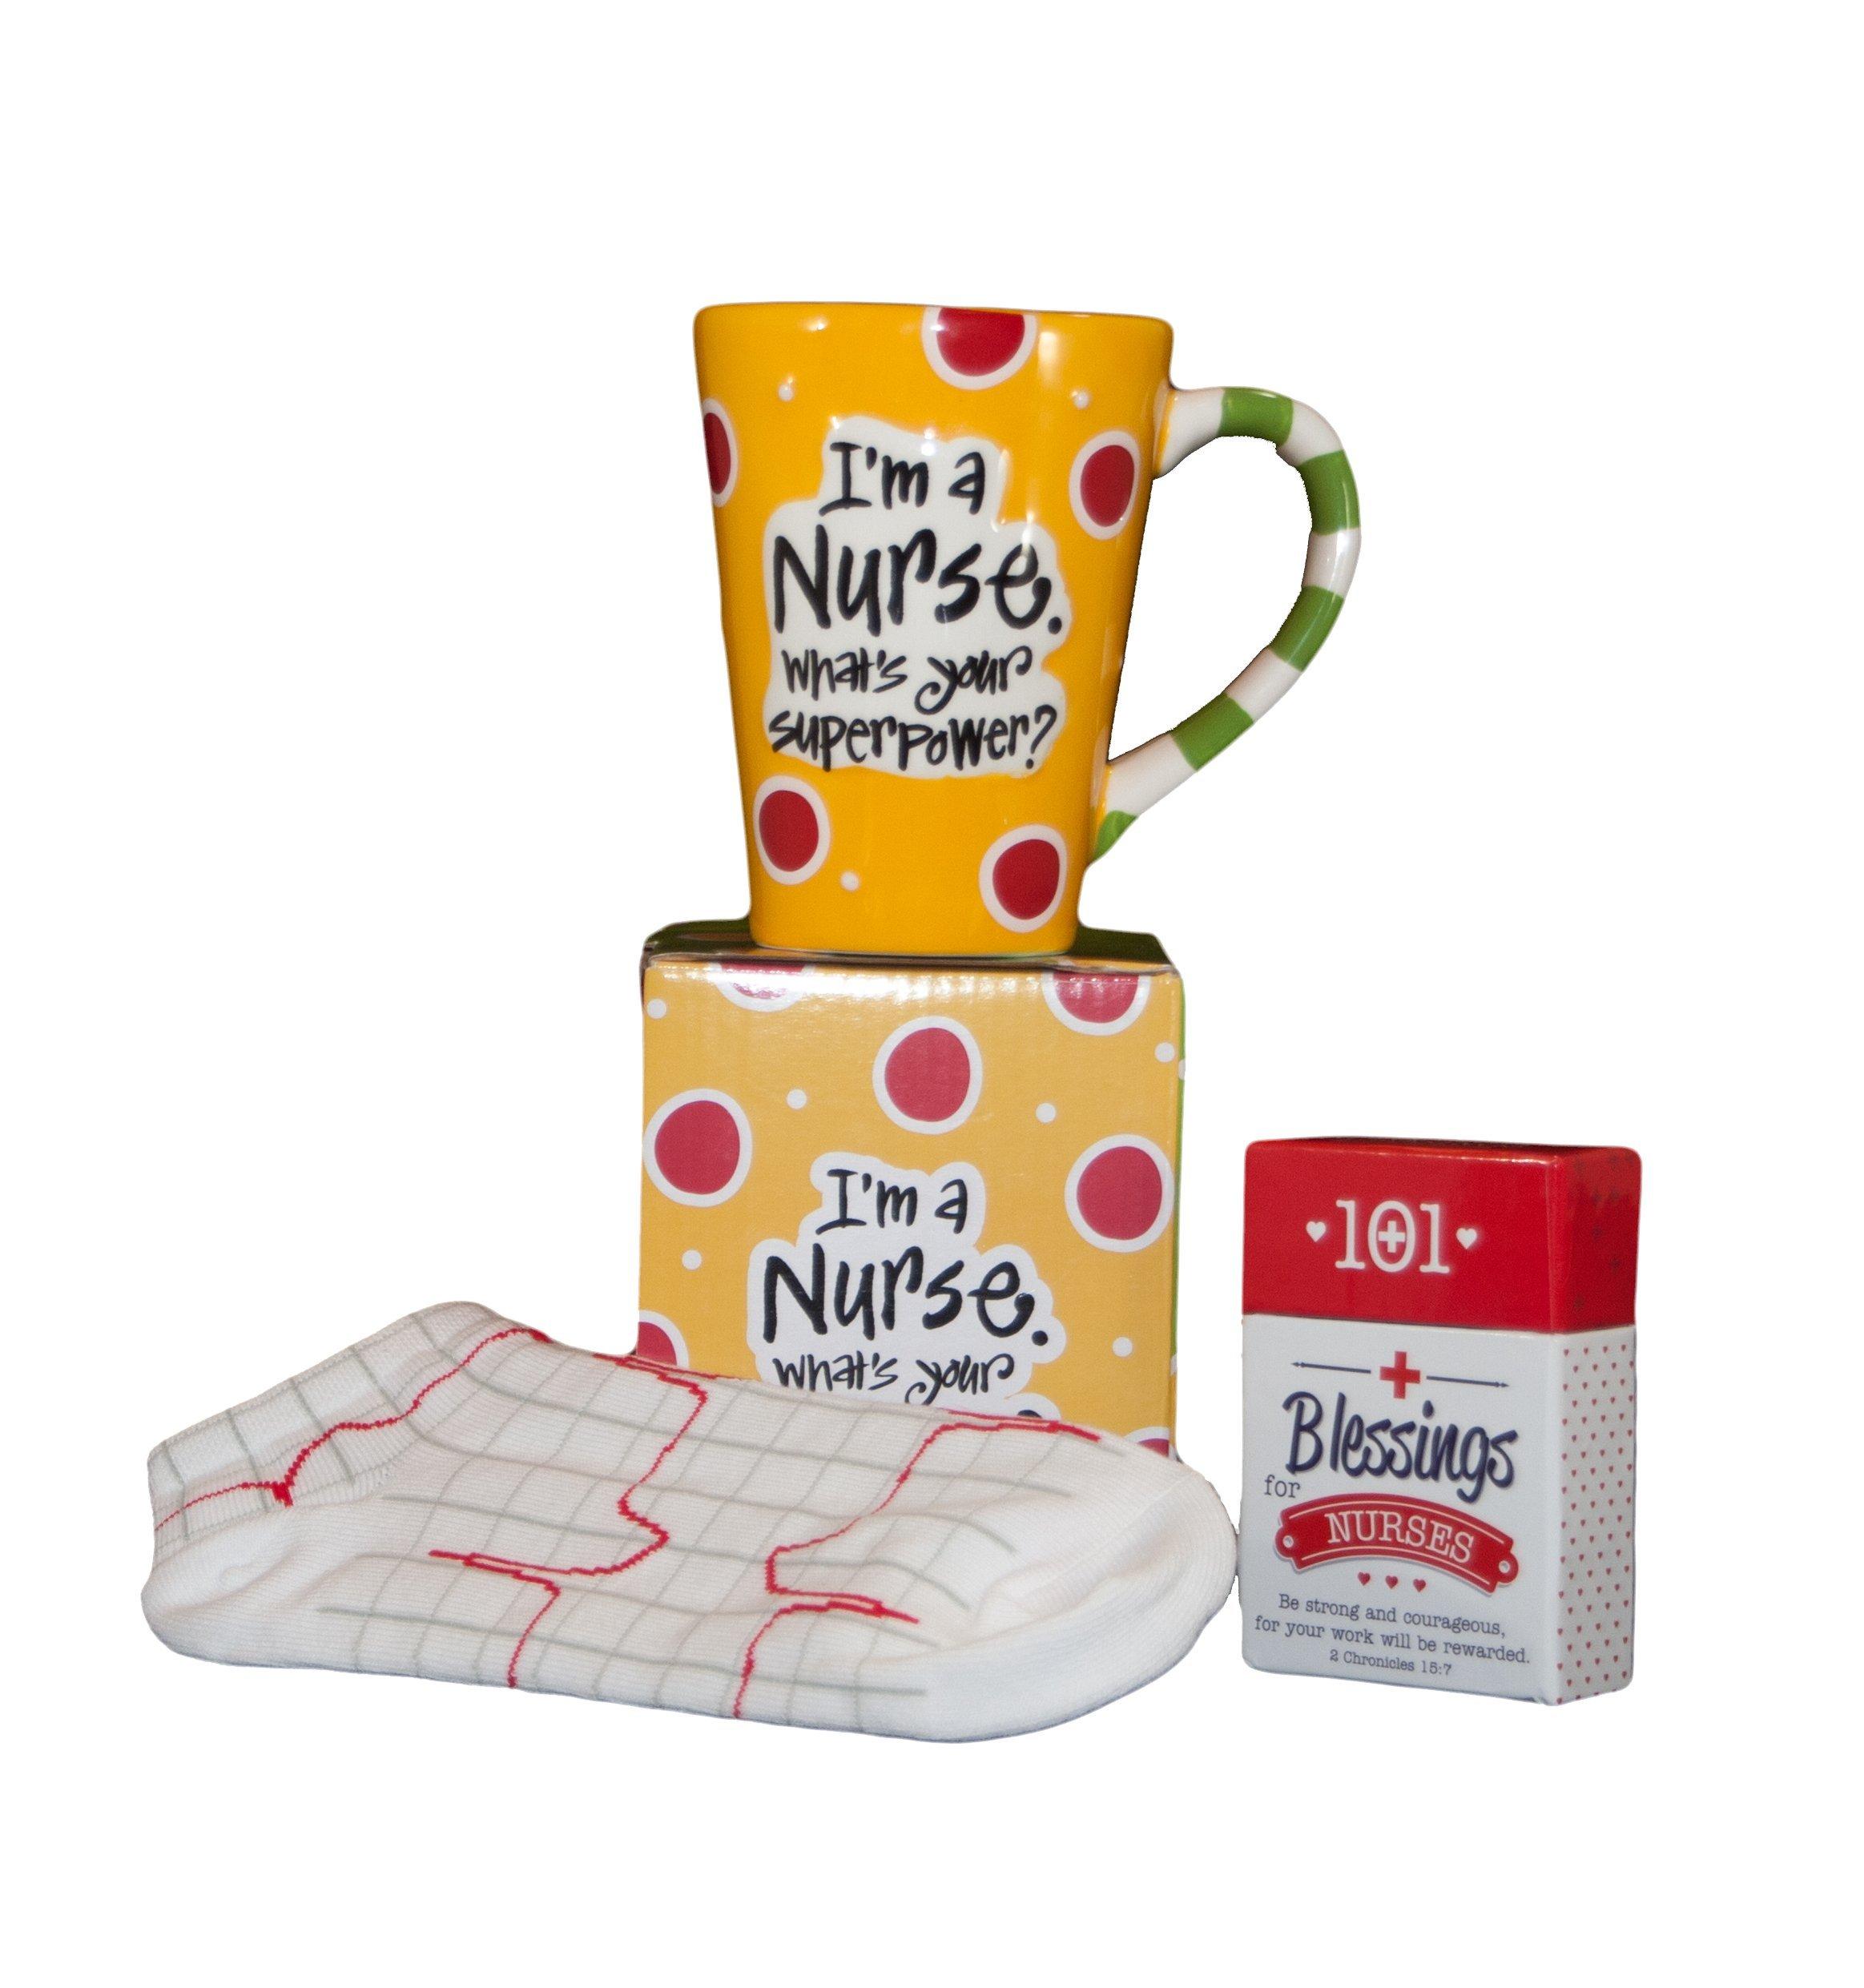 Nurse Gifts for Women Set or Bundle - 3 Items: 1 Nurse Mug with Box, 1 Pair Heartbeat EKG Nurse Socks and a Box of 101 Blessings for Nurses Cards.